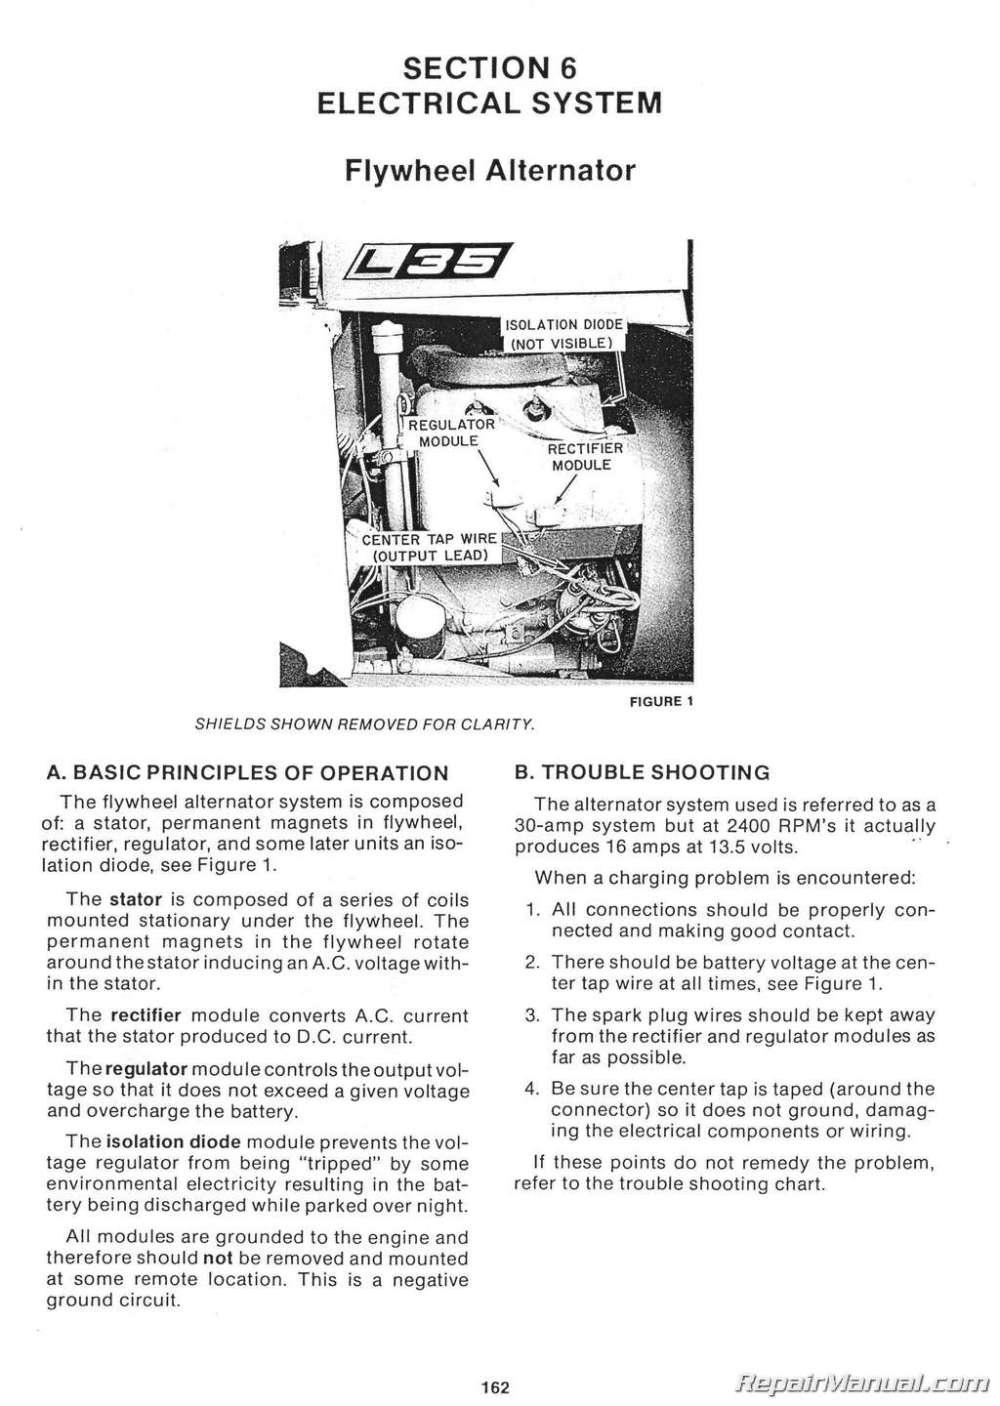 medium resolution of ford new holland l35 l775 l778 l779 skid steer service manual new holland 775 skid steer parts diagram